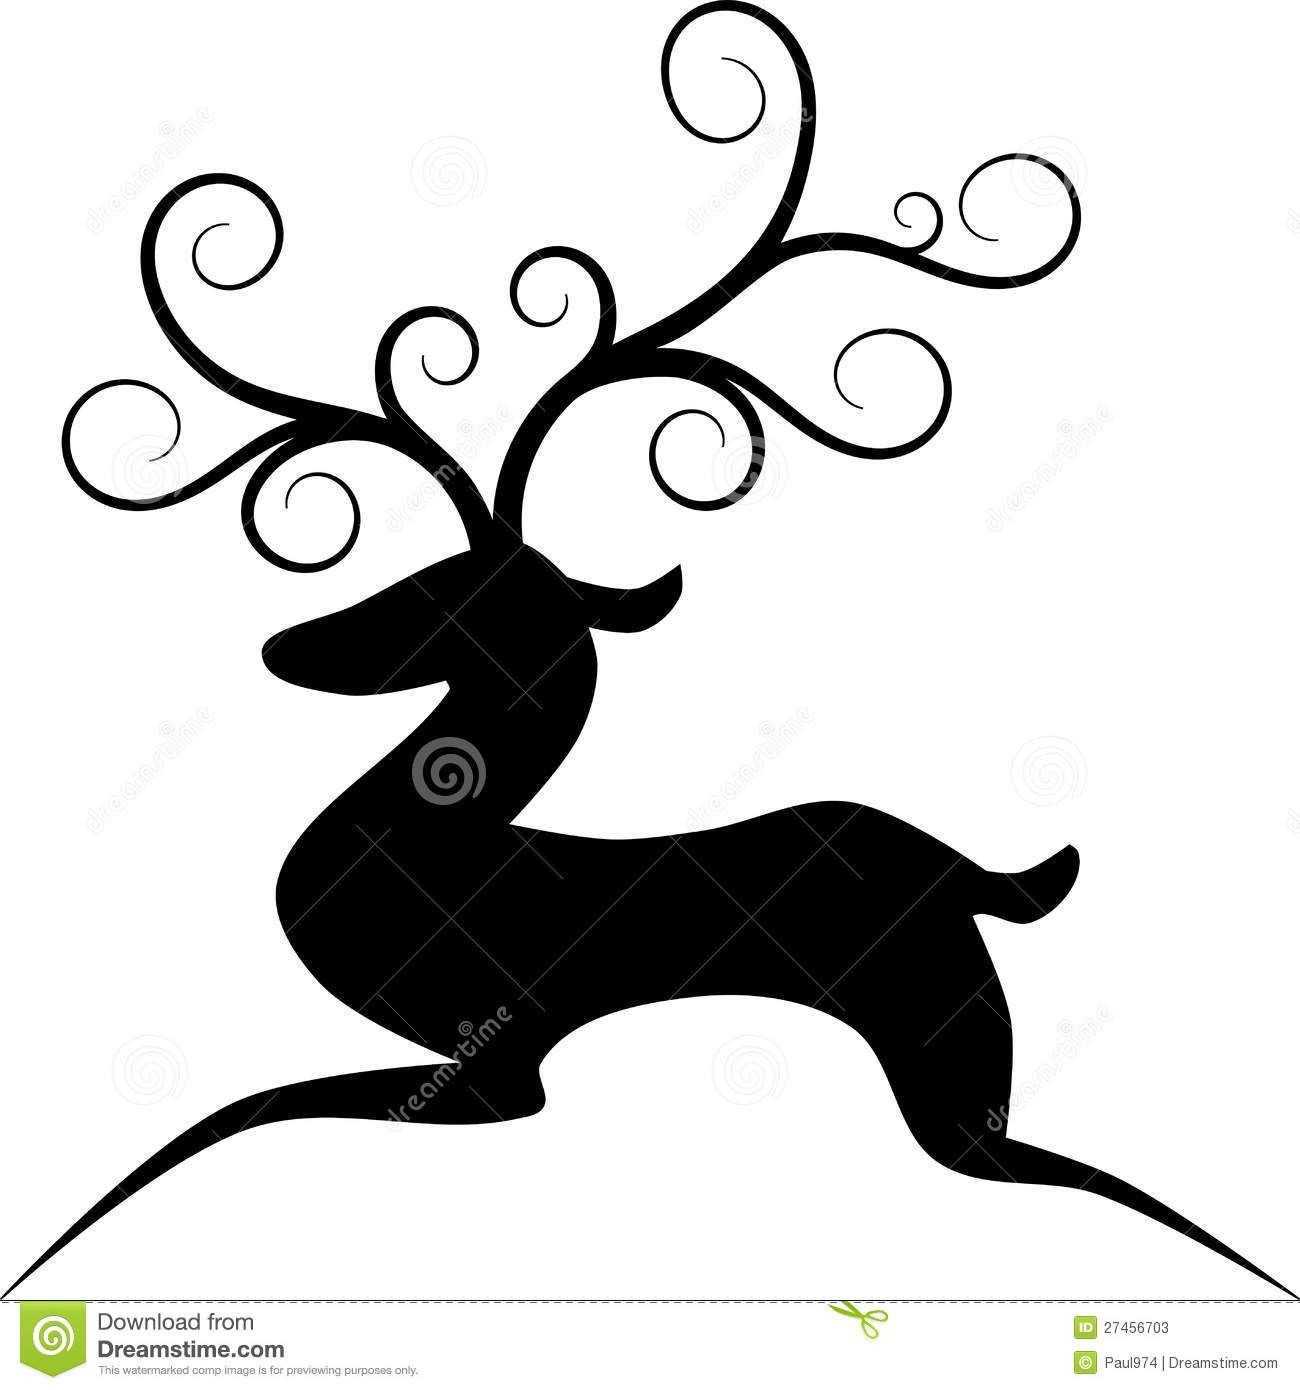 1300x1390 Reindeer Silhouettes Simple Illustration Stylized Reindeer